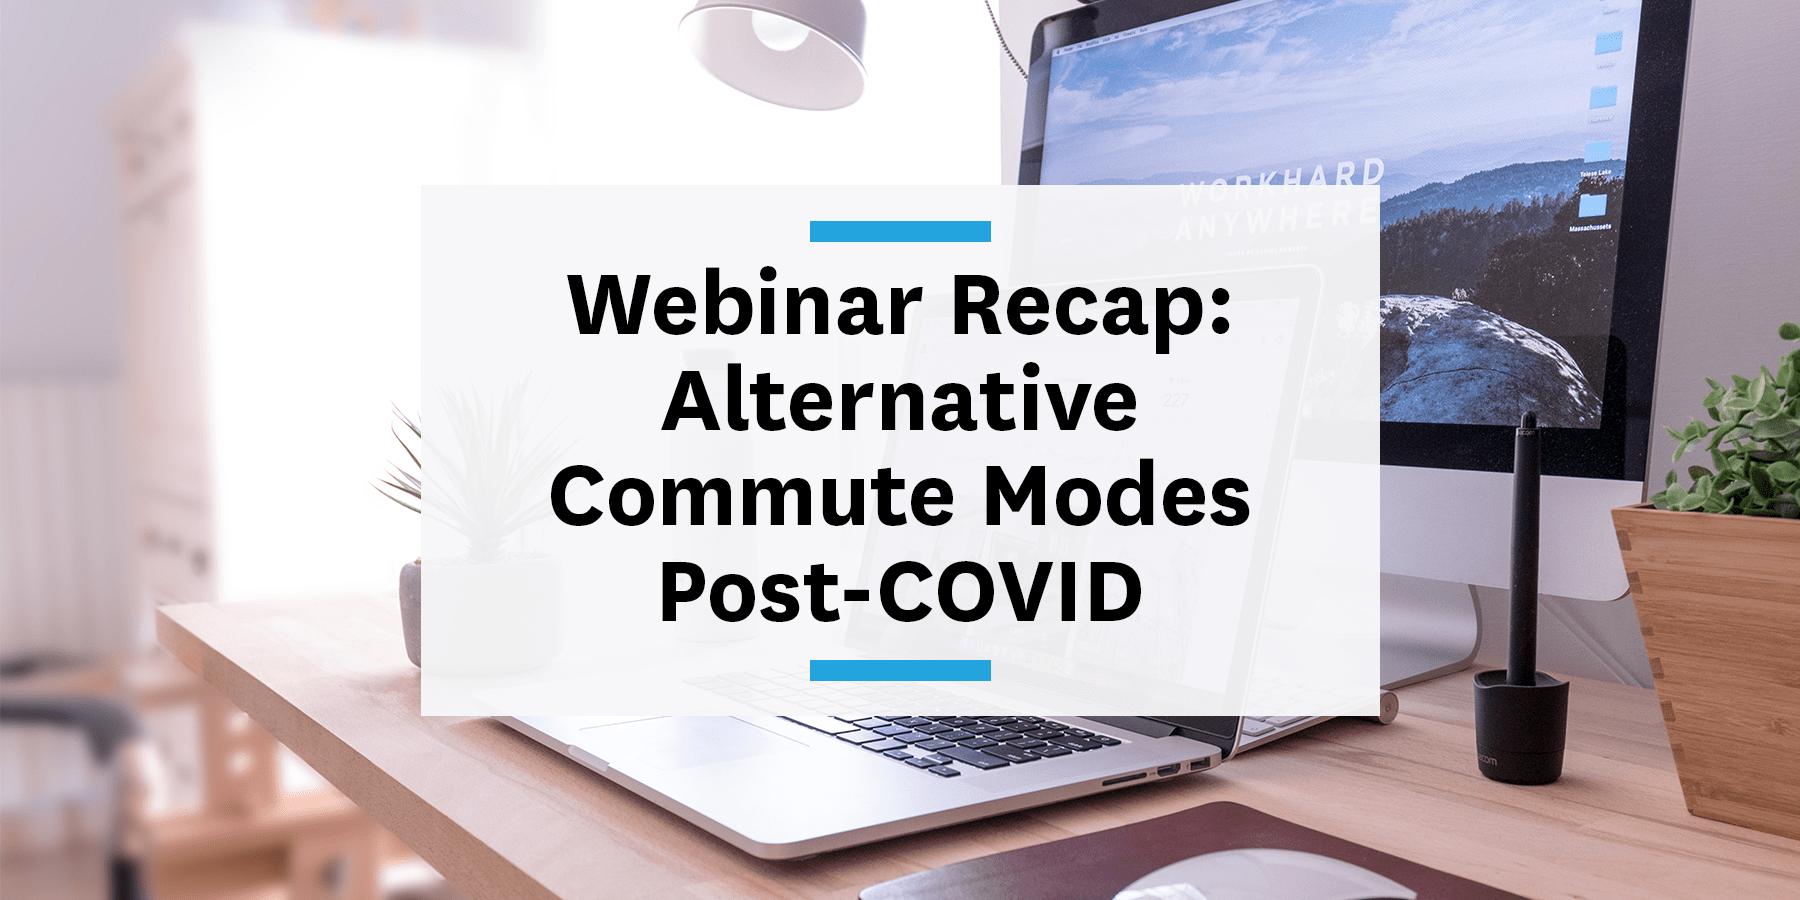 commute+ reimagined webinar recap alternative commute modes post-covid